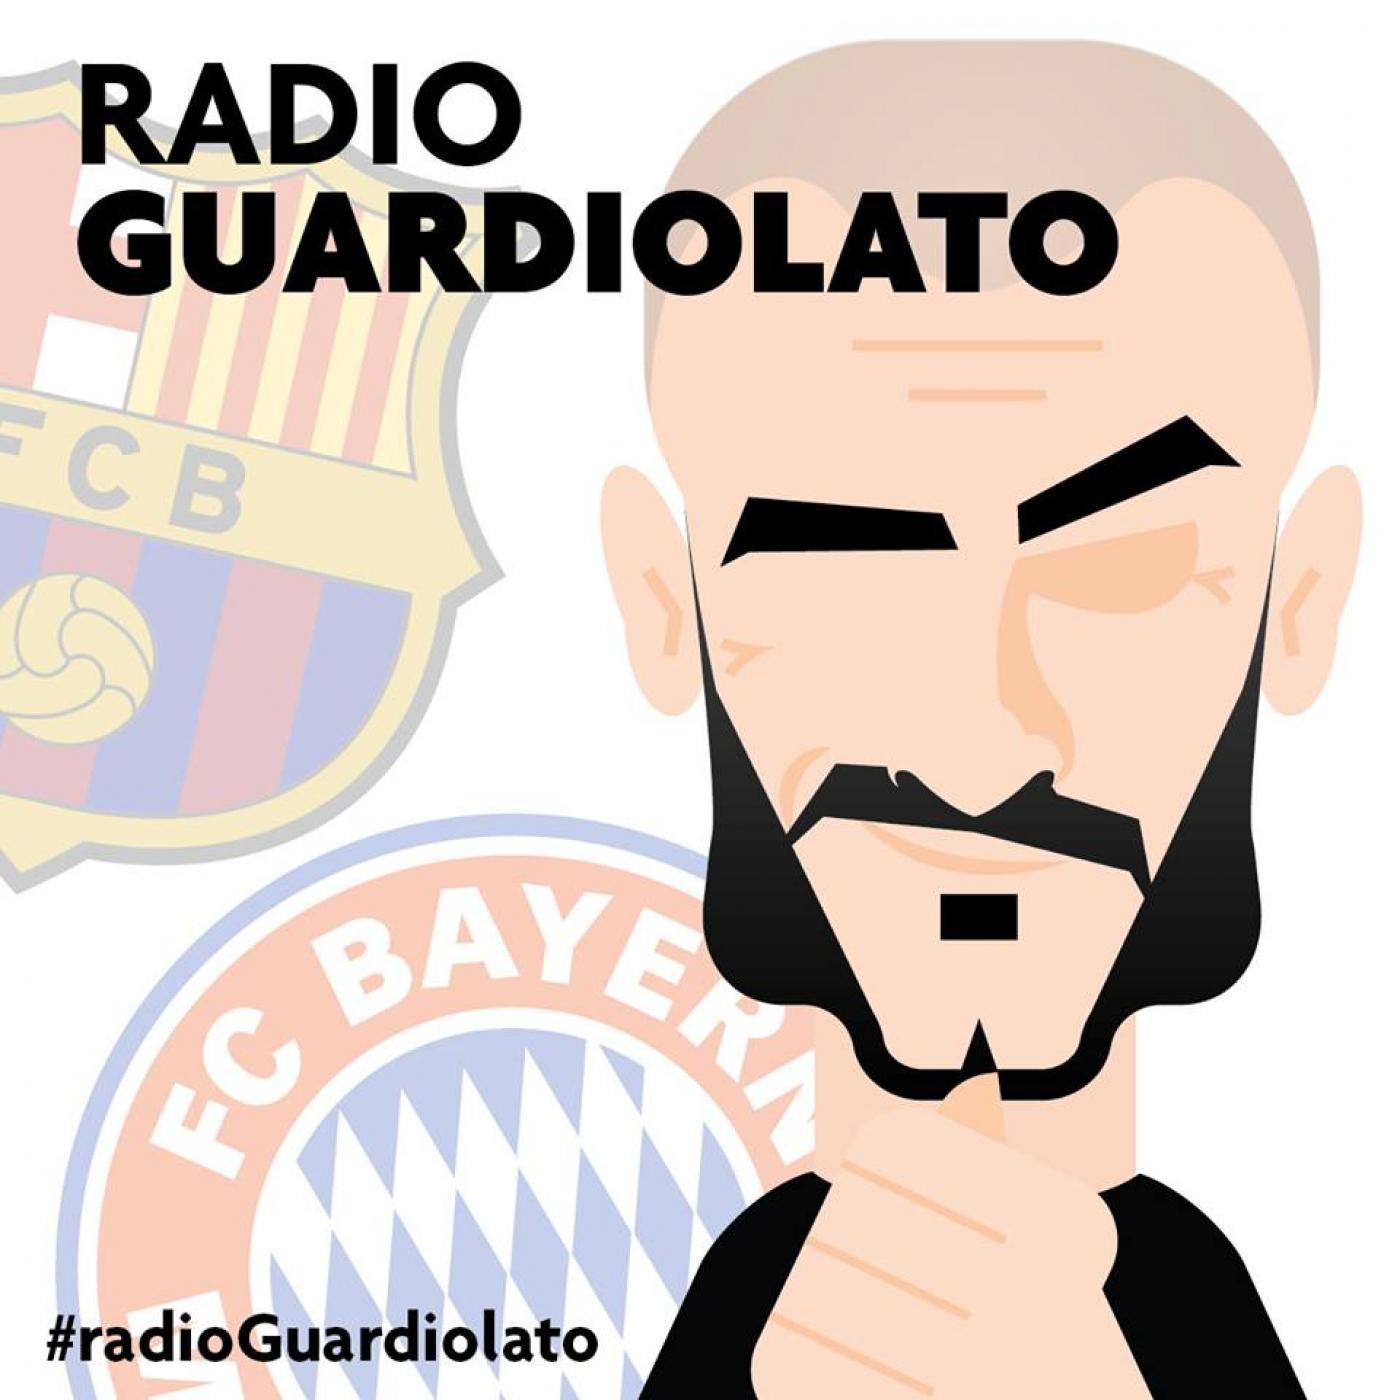 Radio Guardiolato 1x04: Especial Barça-Bayern (Parte I)